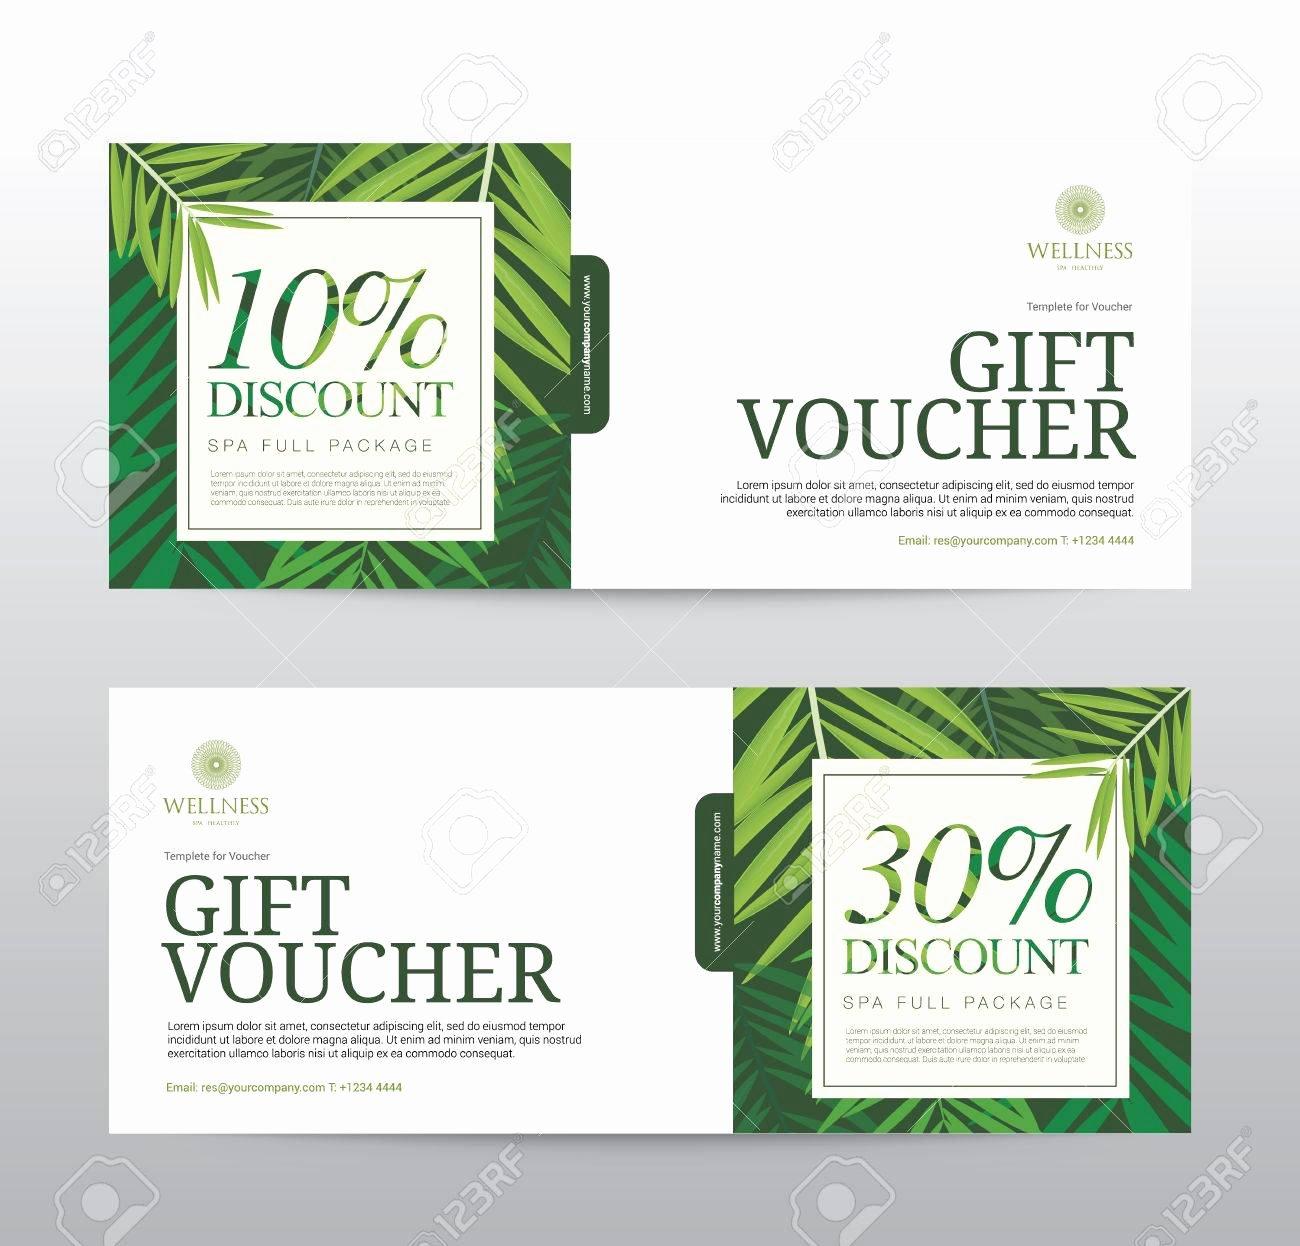 Hotel Gift Certificate Template Best Of Resort Gift Certificate Template